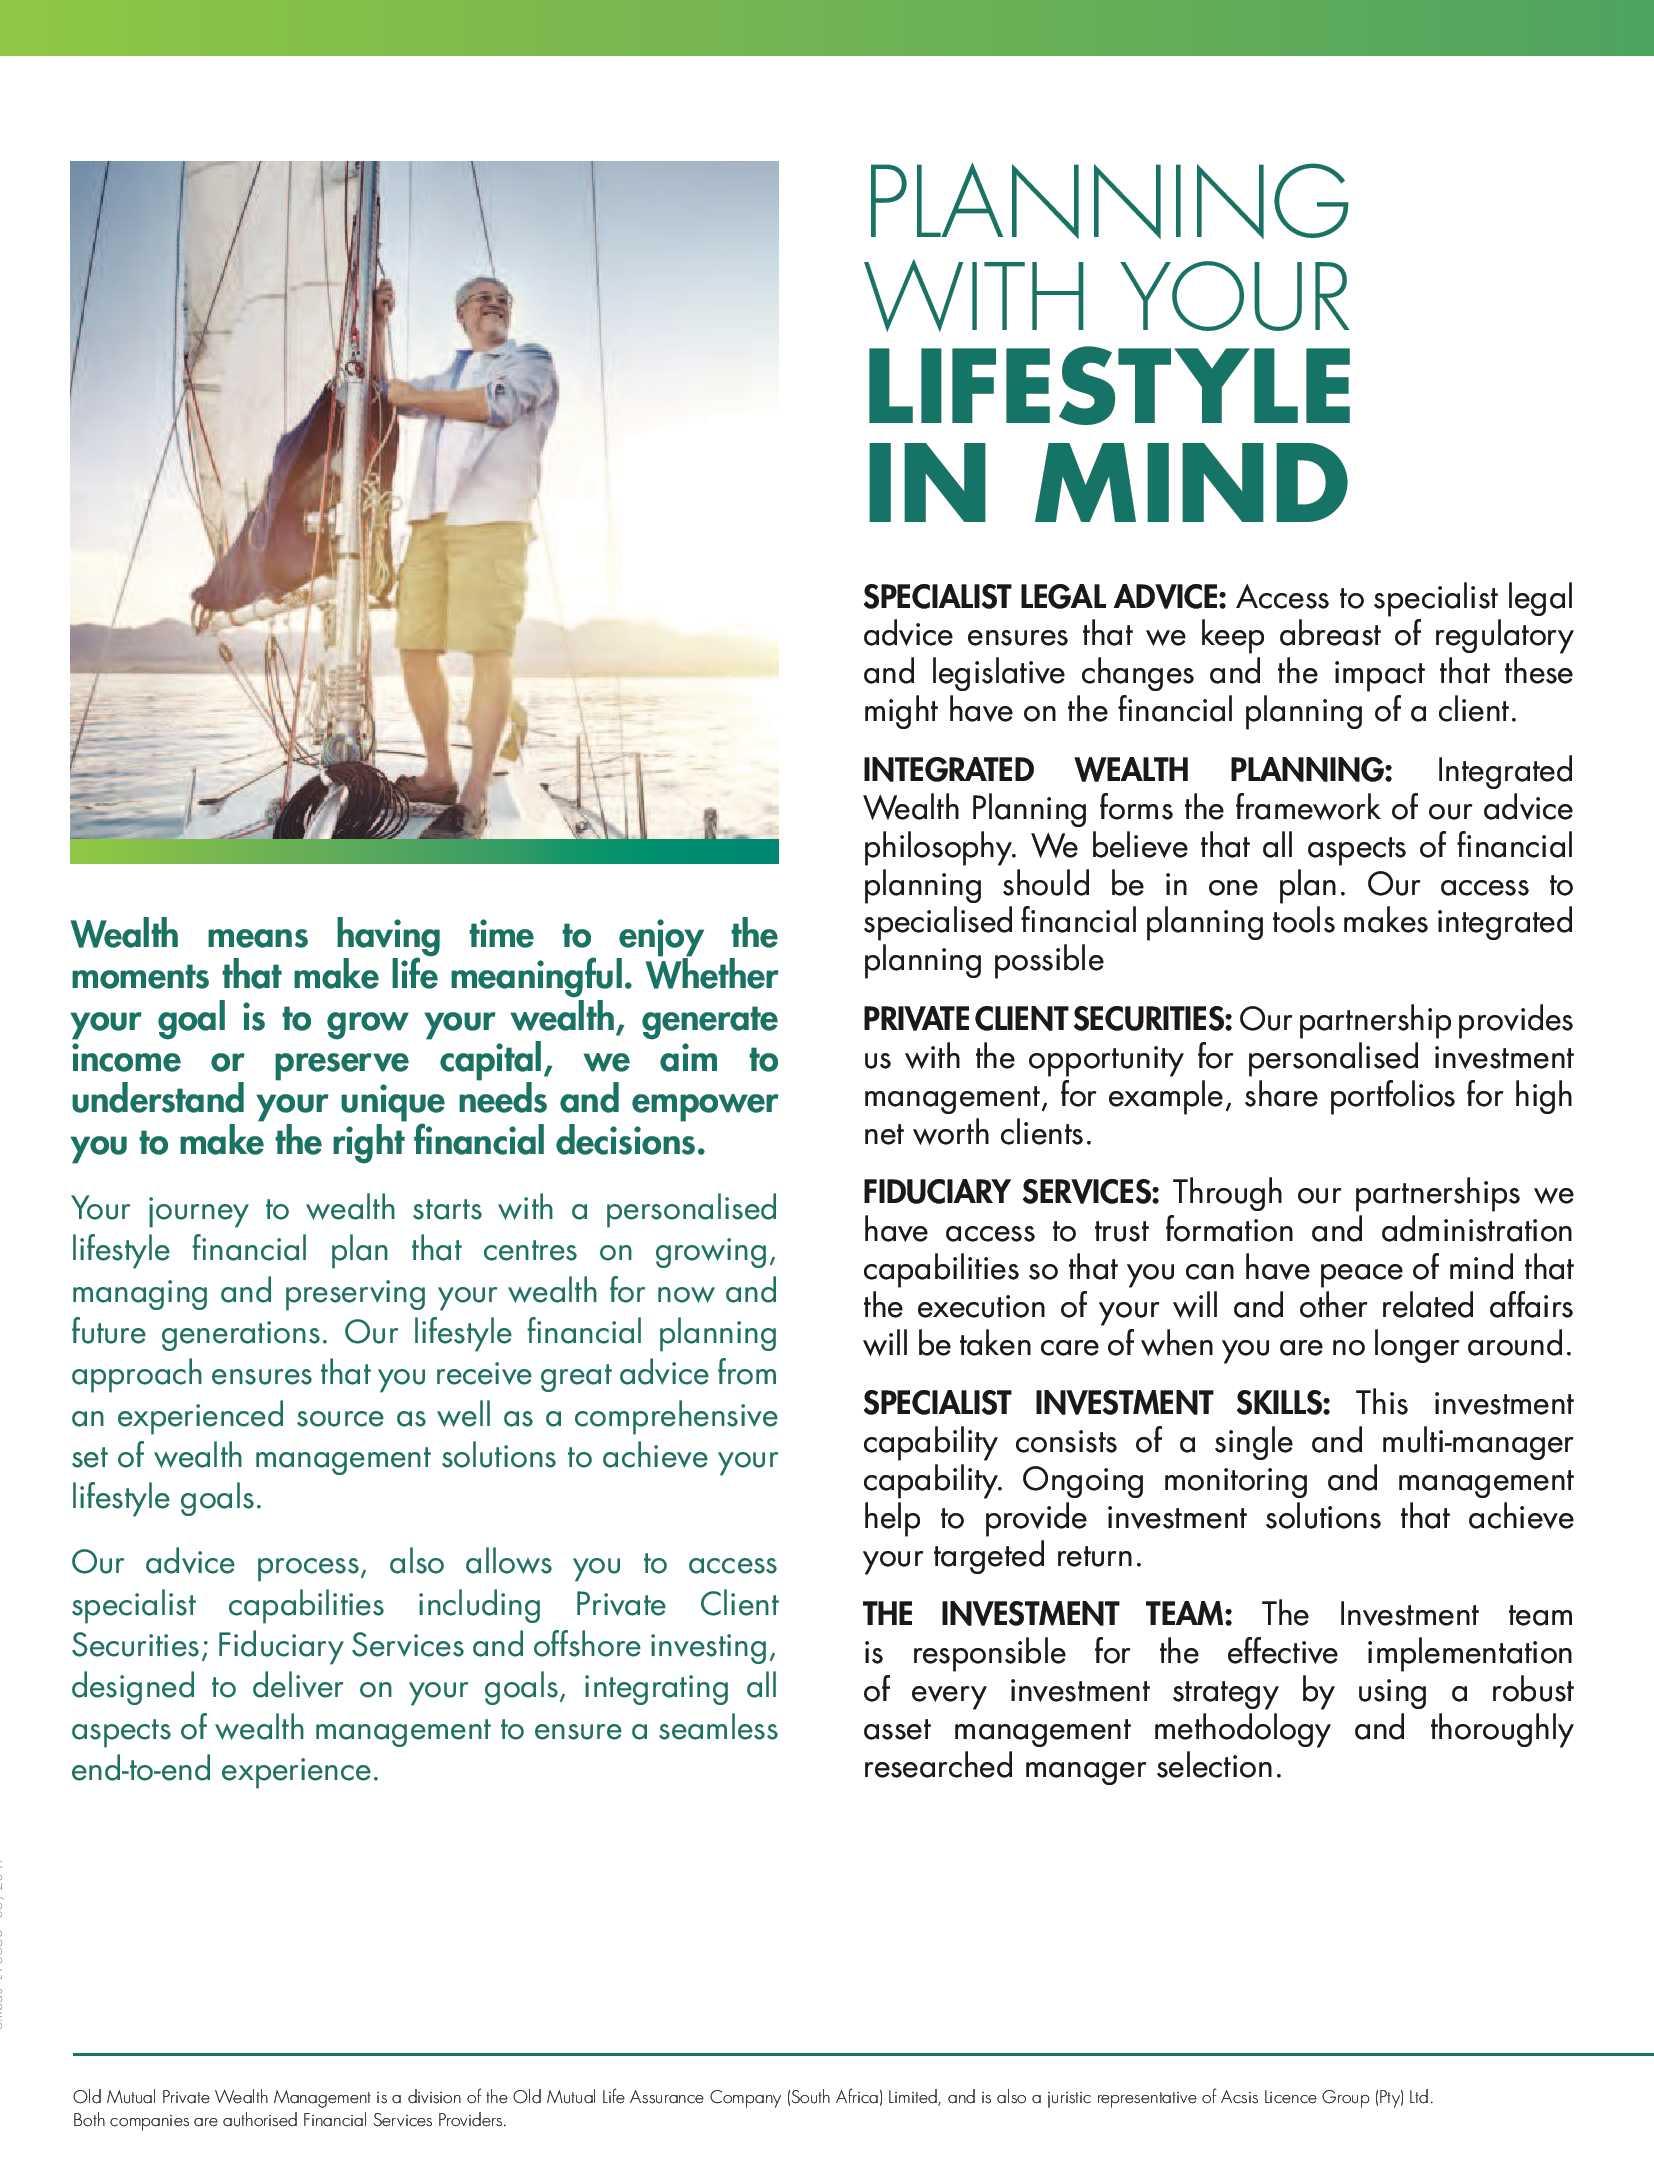 get-magazine-ballitoumhlanga-july-2017-2-epapers-page-2